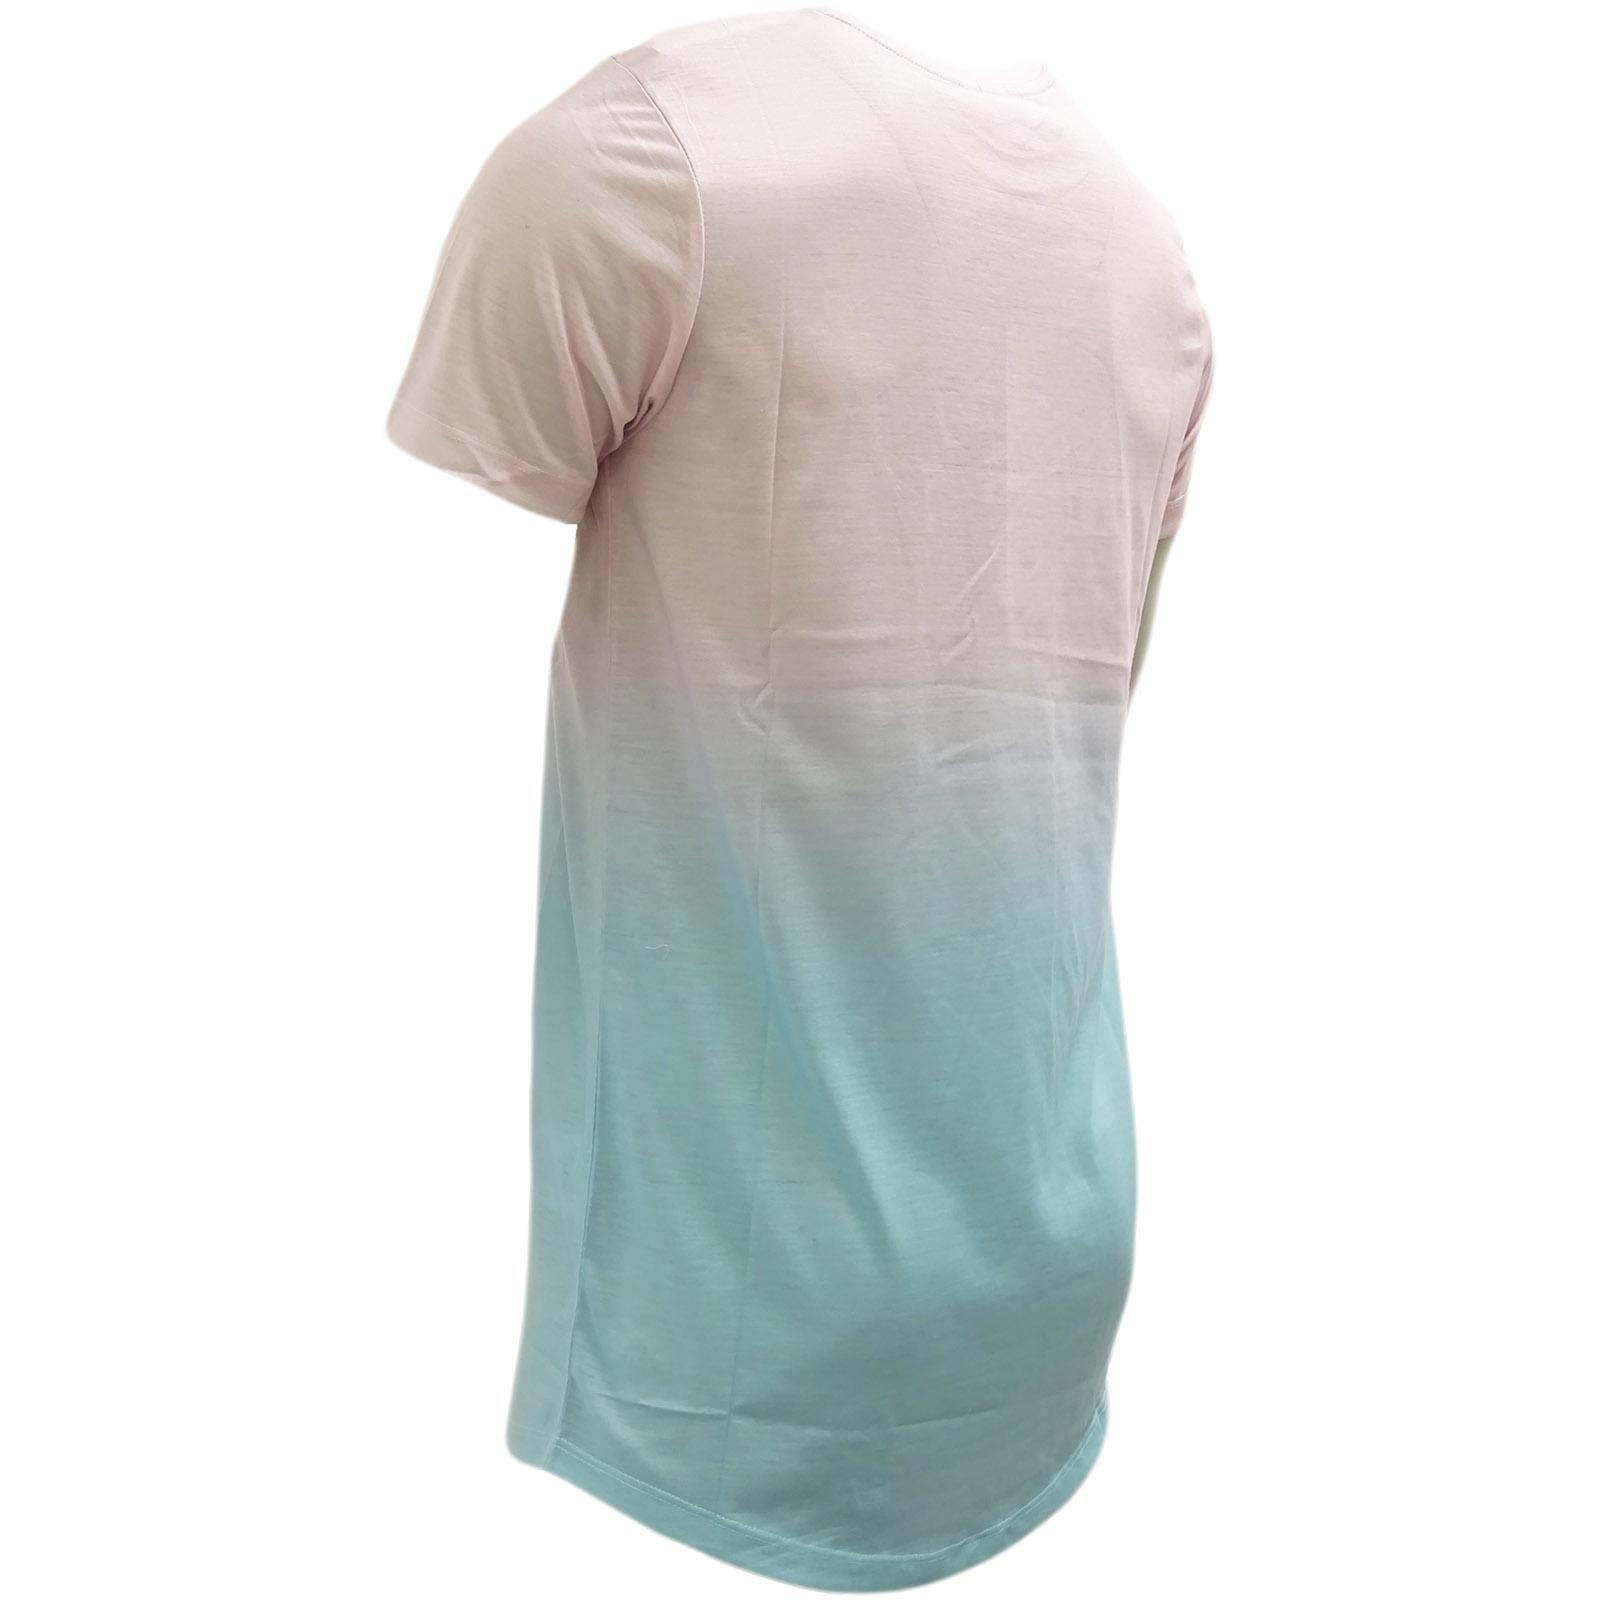 90f8932c7ed Sentinel Mens T-Shirts by Hype (Bubblegum Fade)